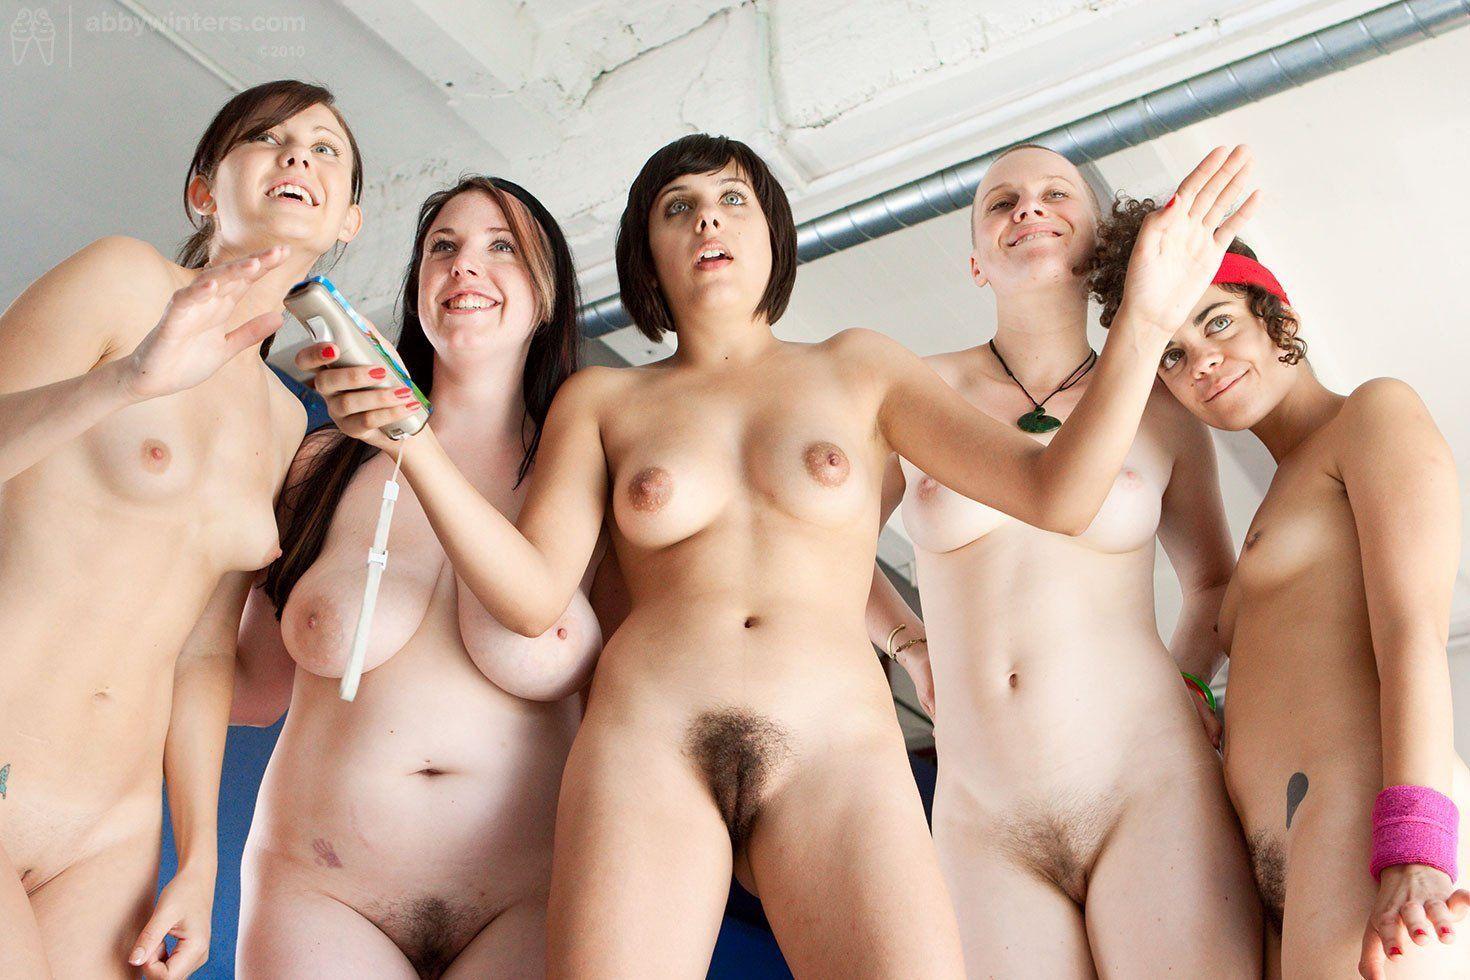 Group girls nude